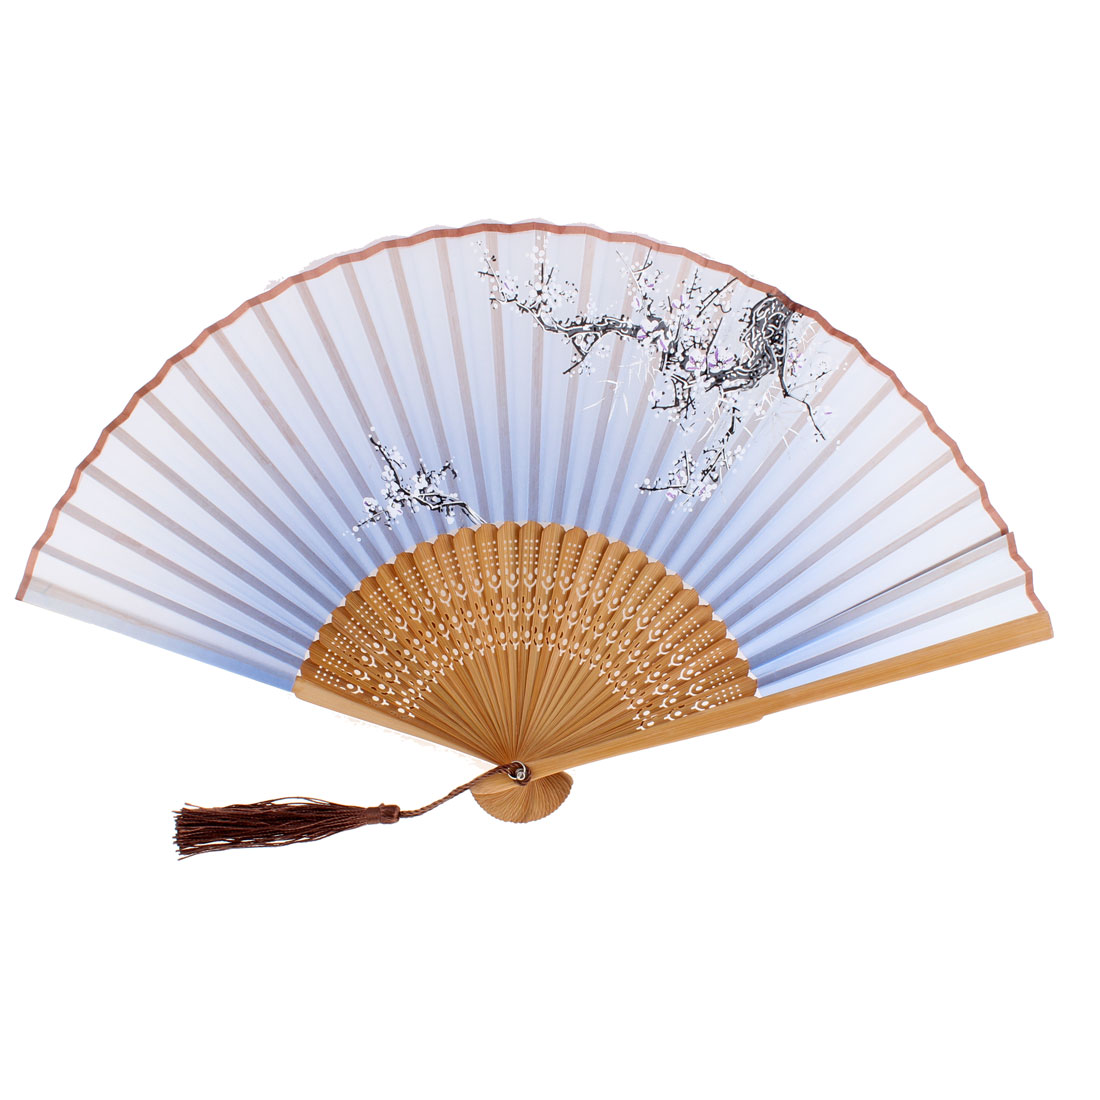 Lady Plum Blossom Pattern Dance Wedding Party Folding Hand Fan Sky Blue